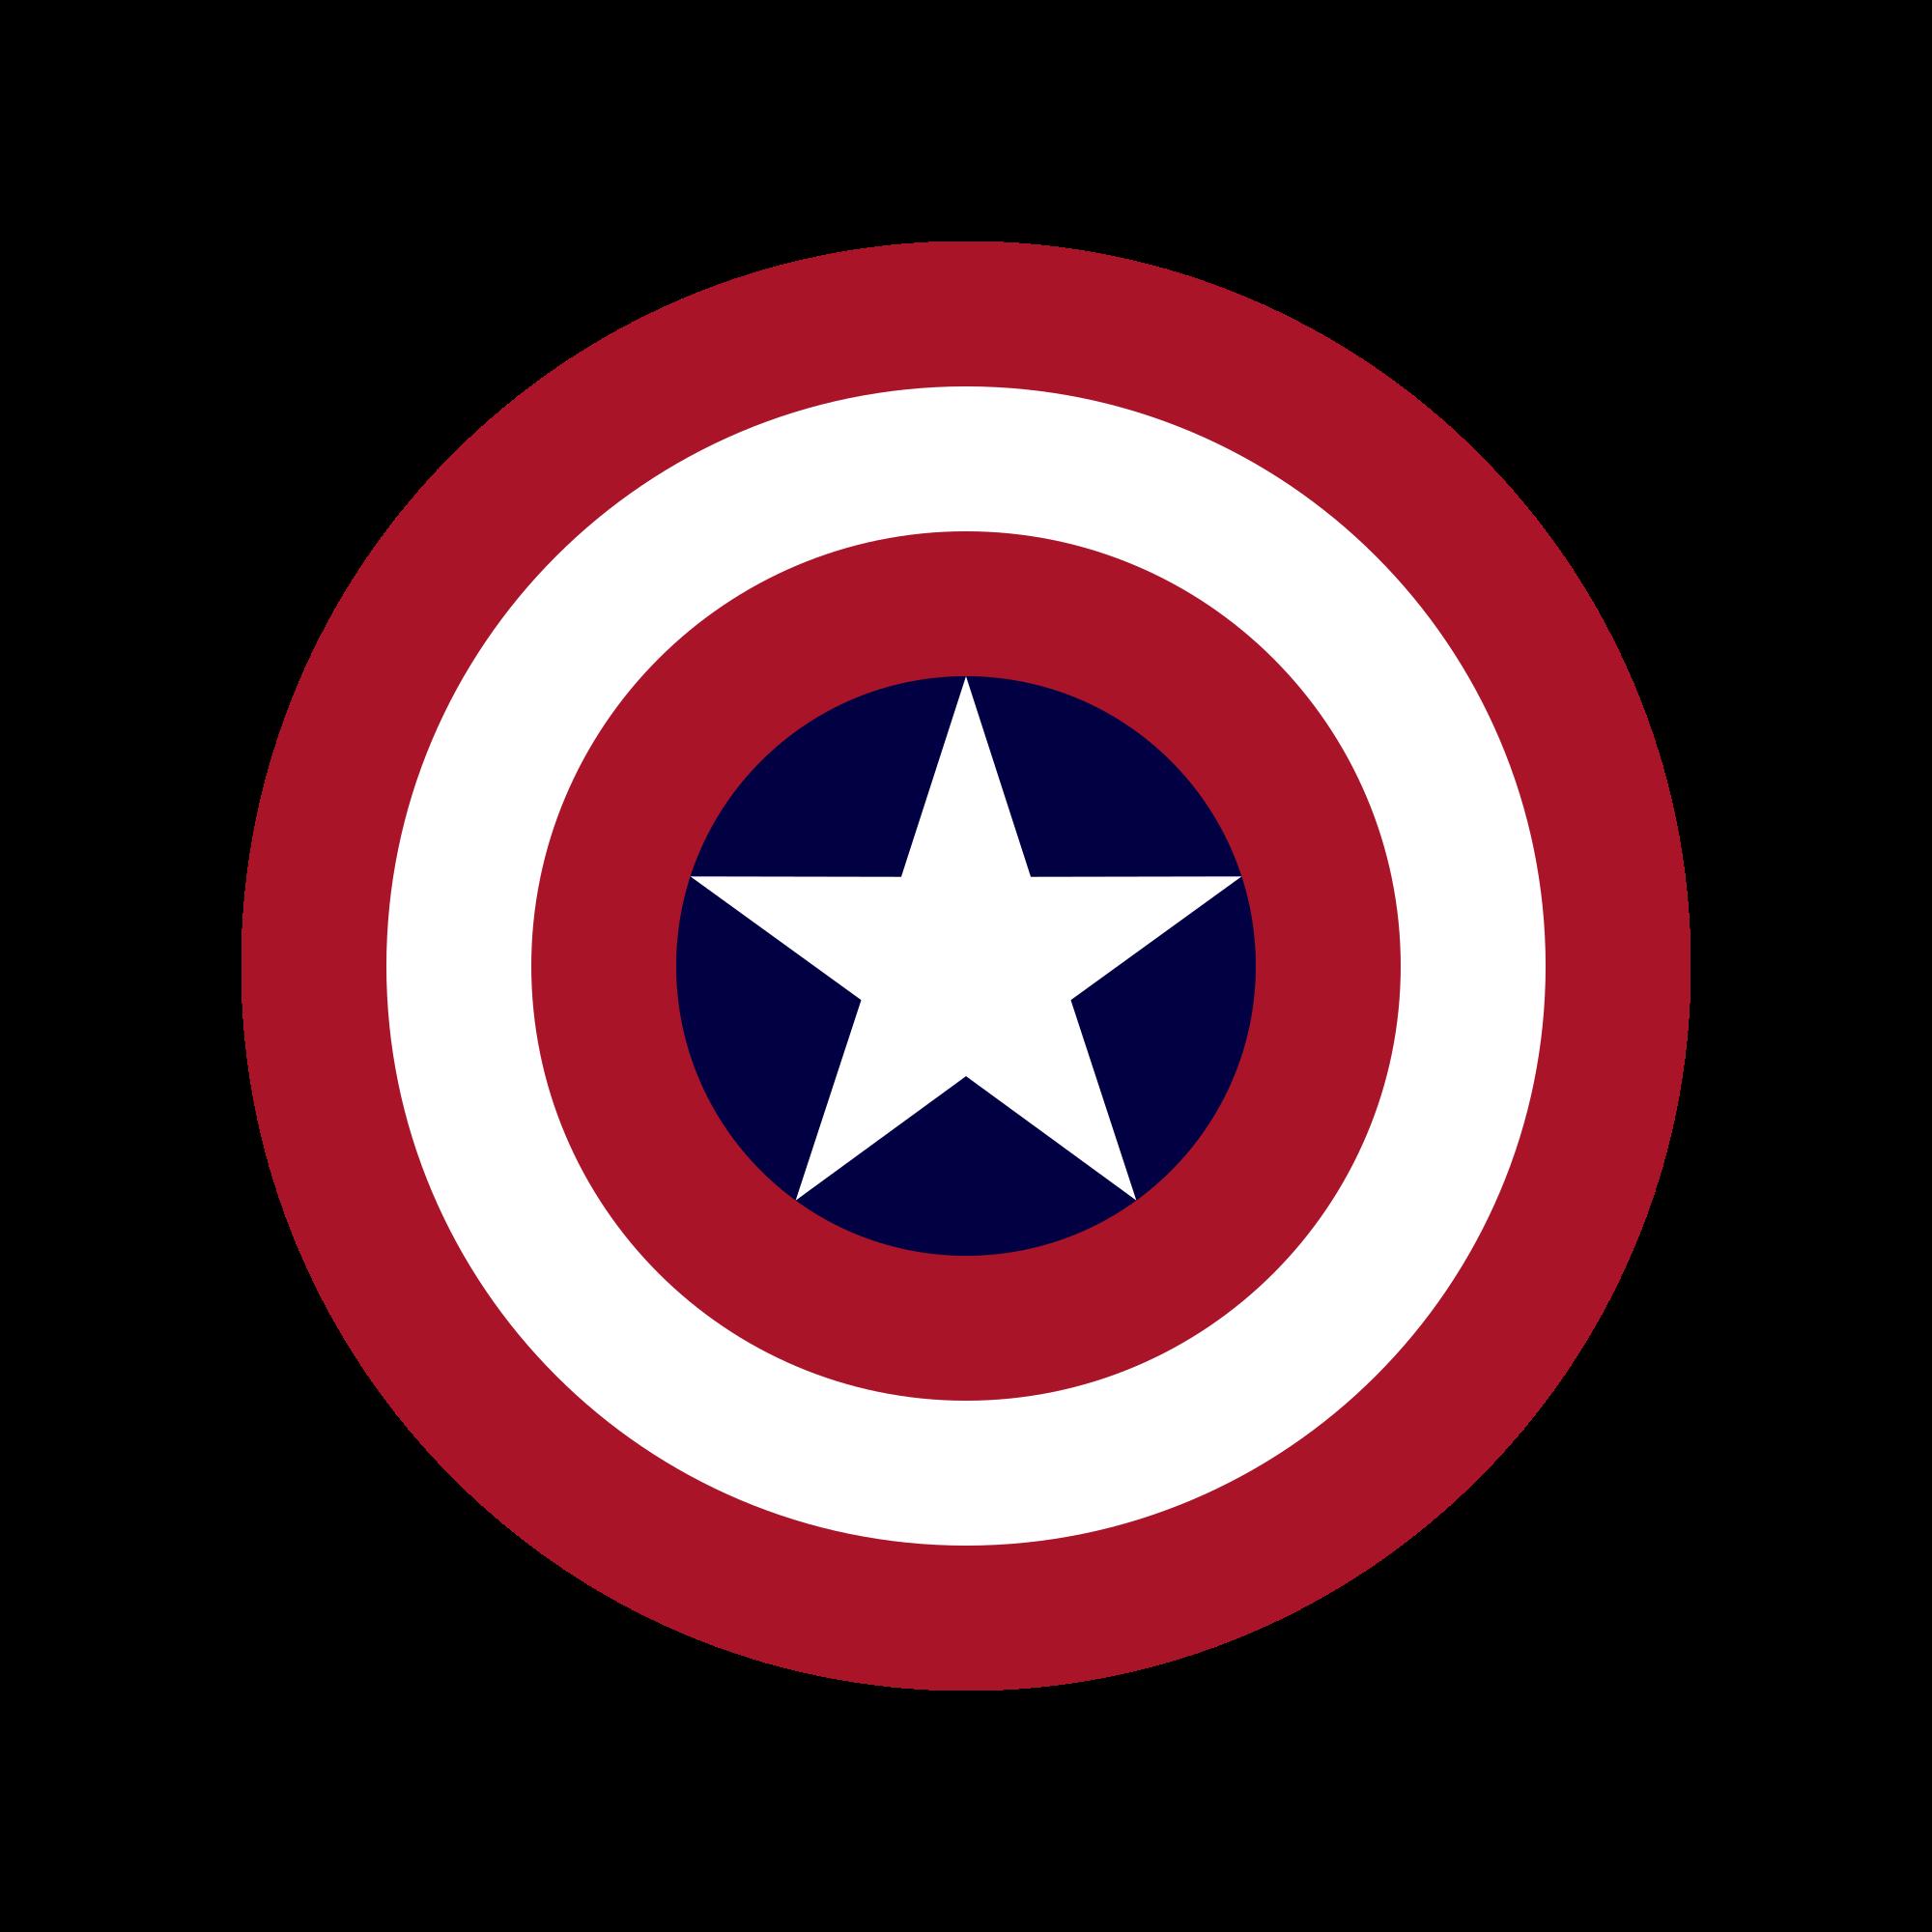 Arvind Pandit 1 Captain America The Winter Soldier Arvind